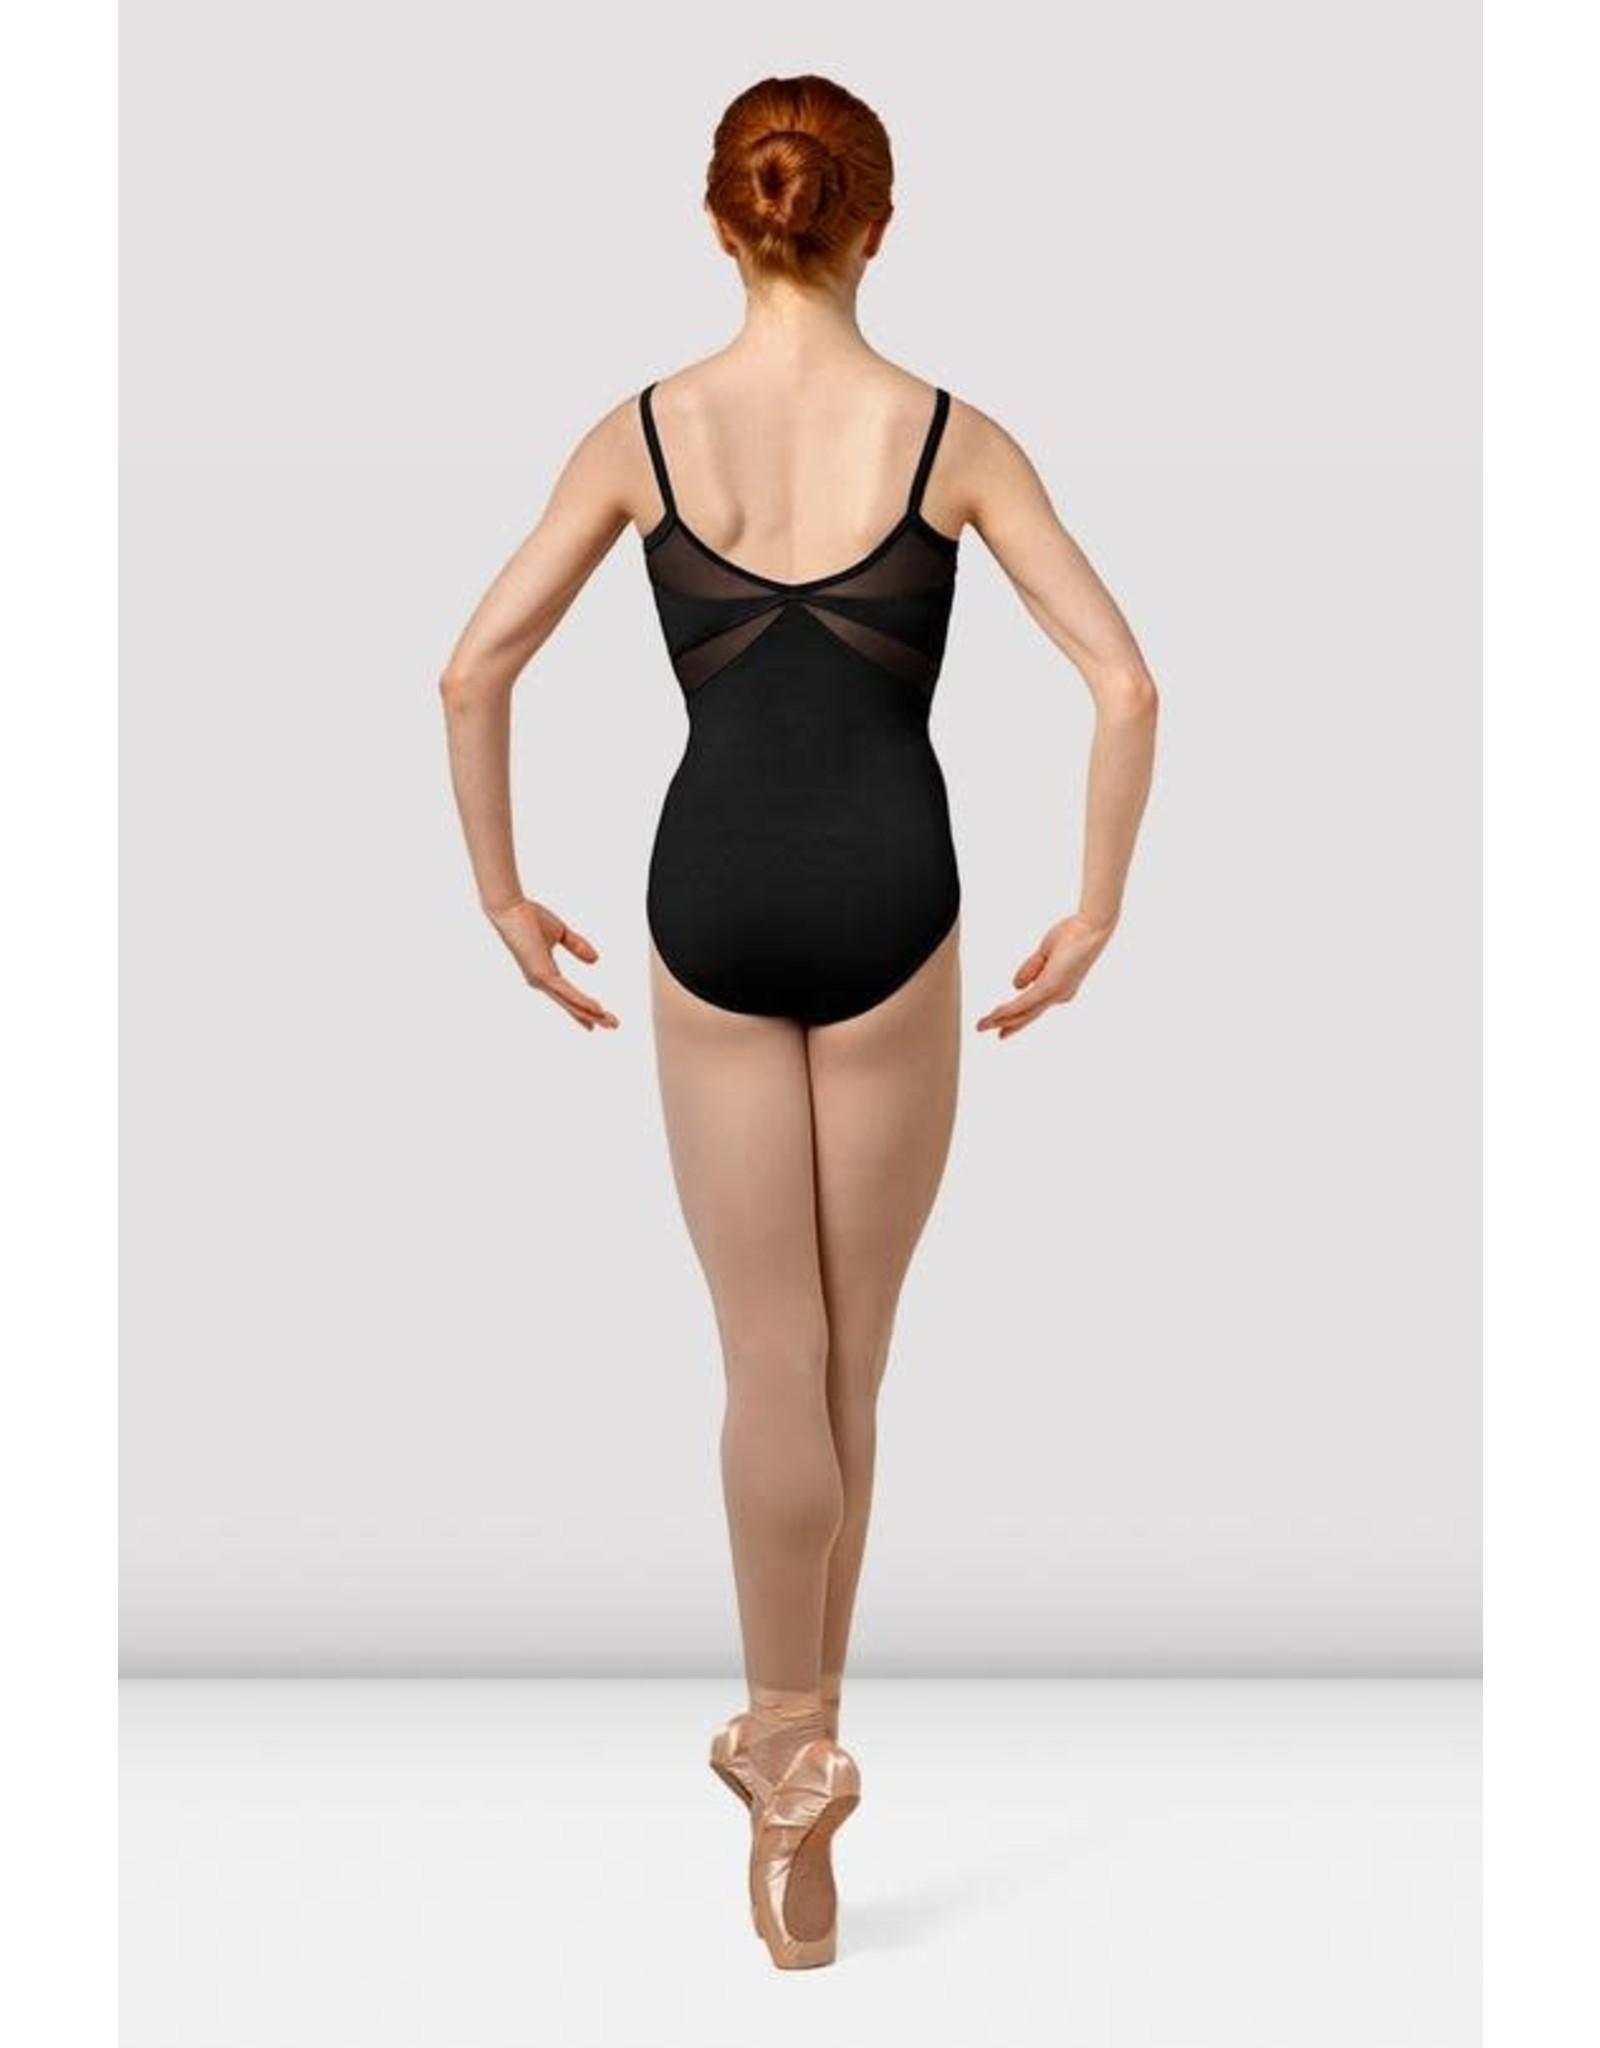 Mirella M4042LM balletpakje spaghettibandjes